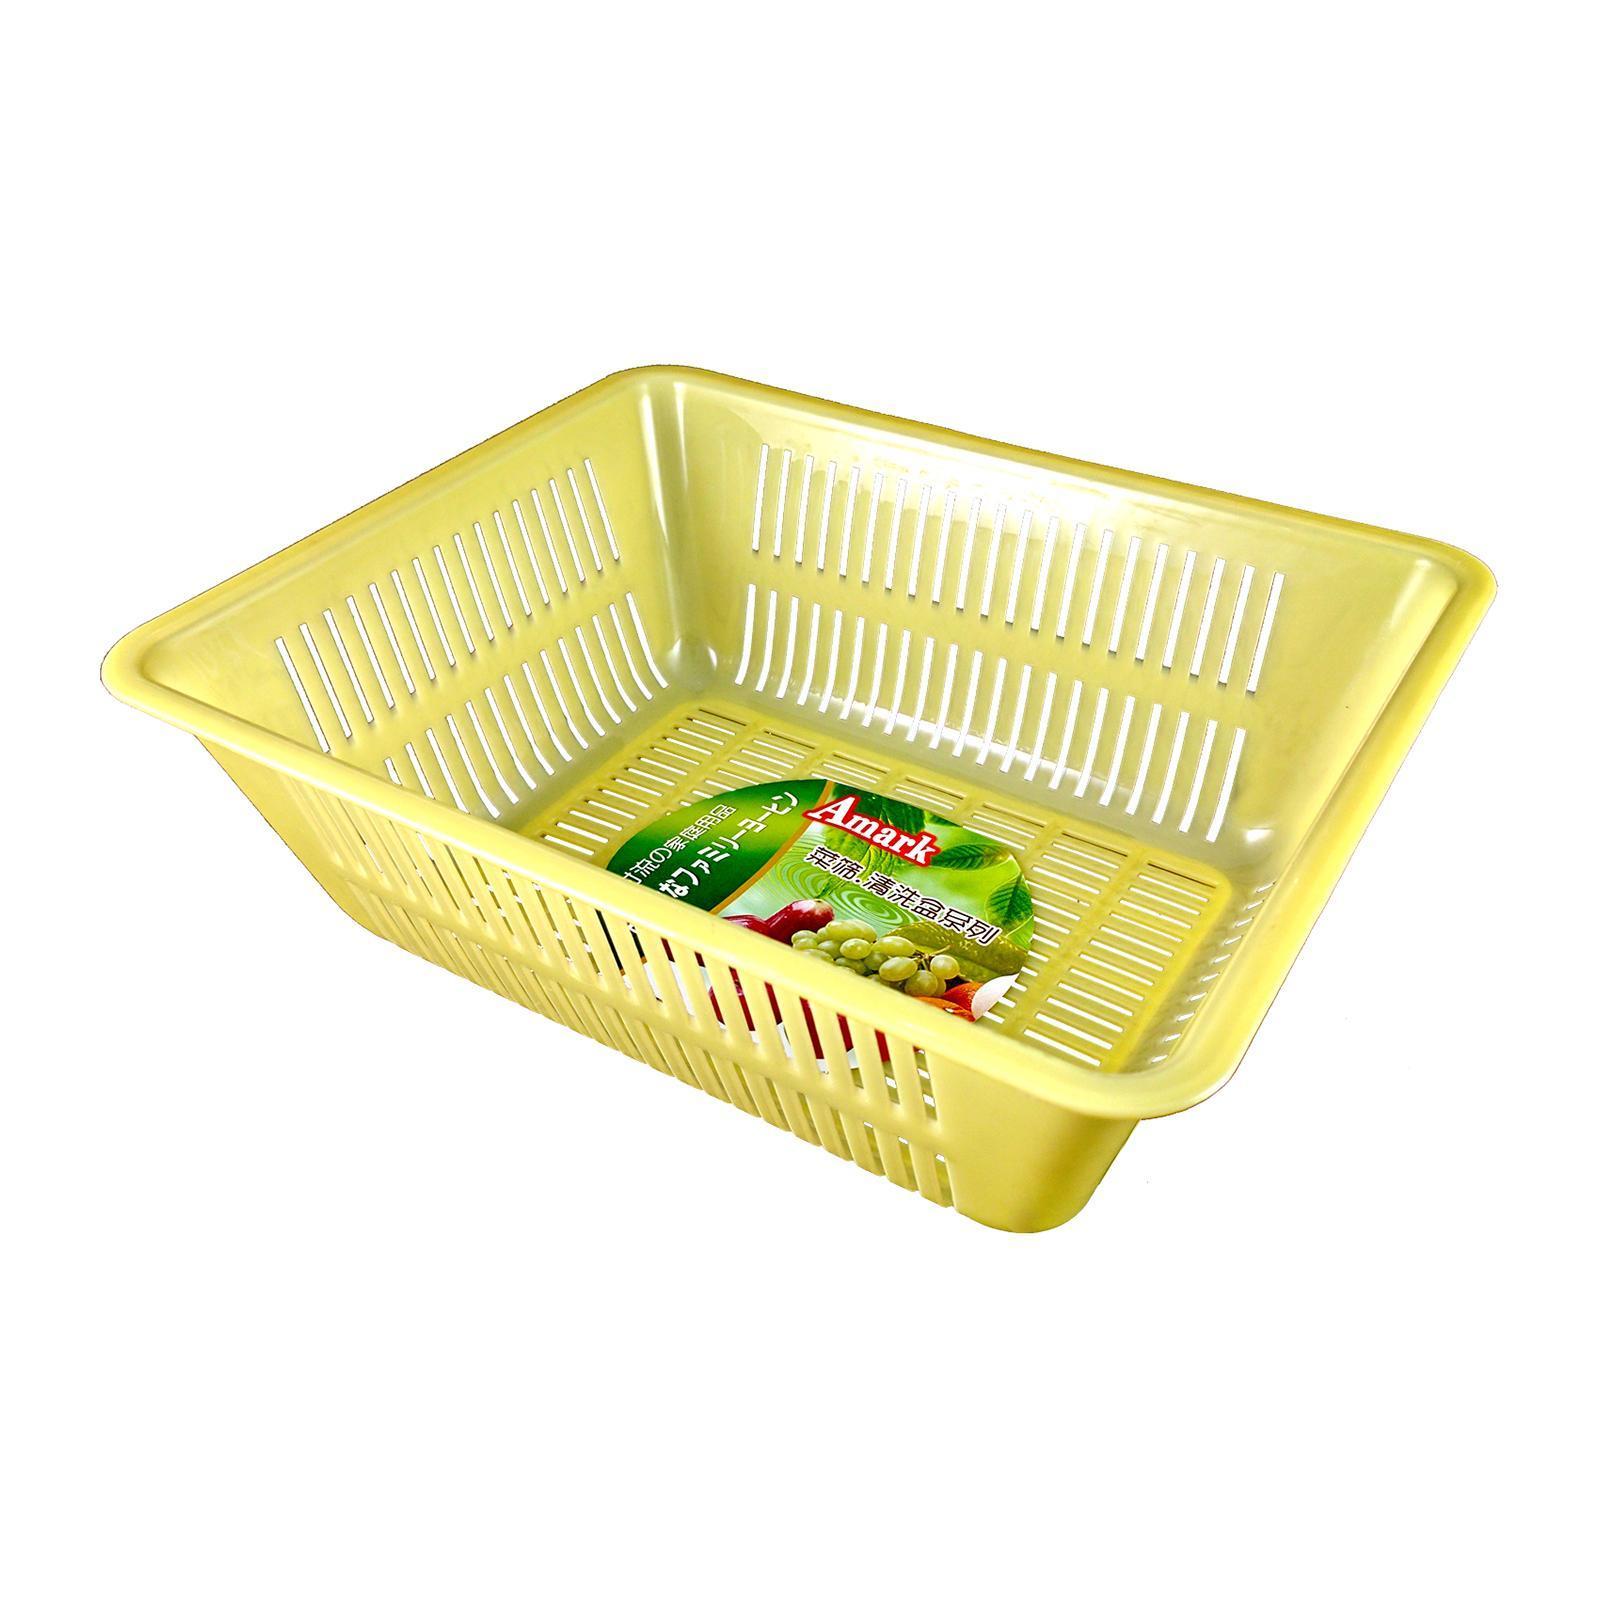 Amark Rectangular Plastic Basket 27x22x10 Cm (Yellow)